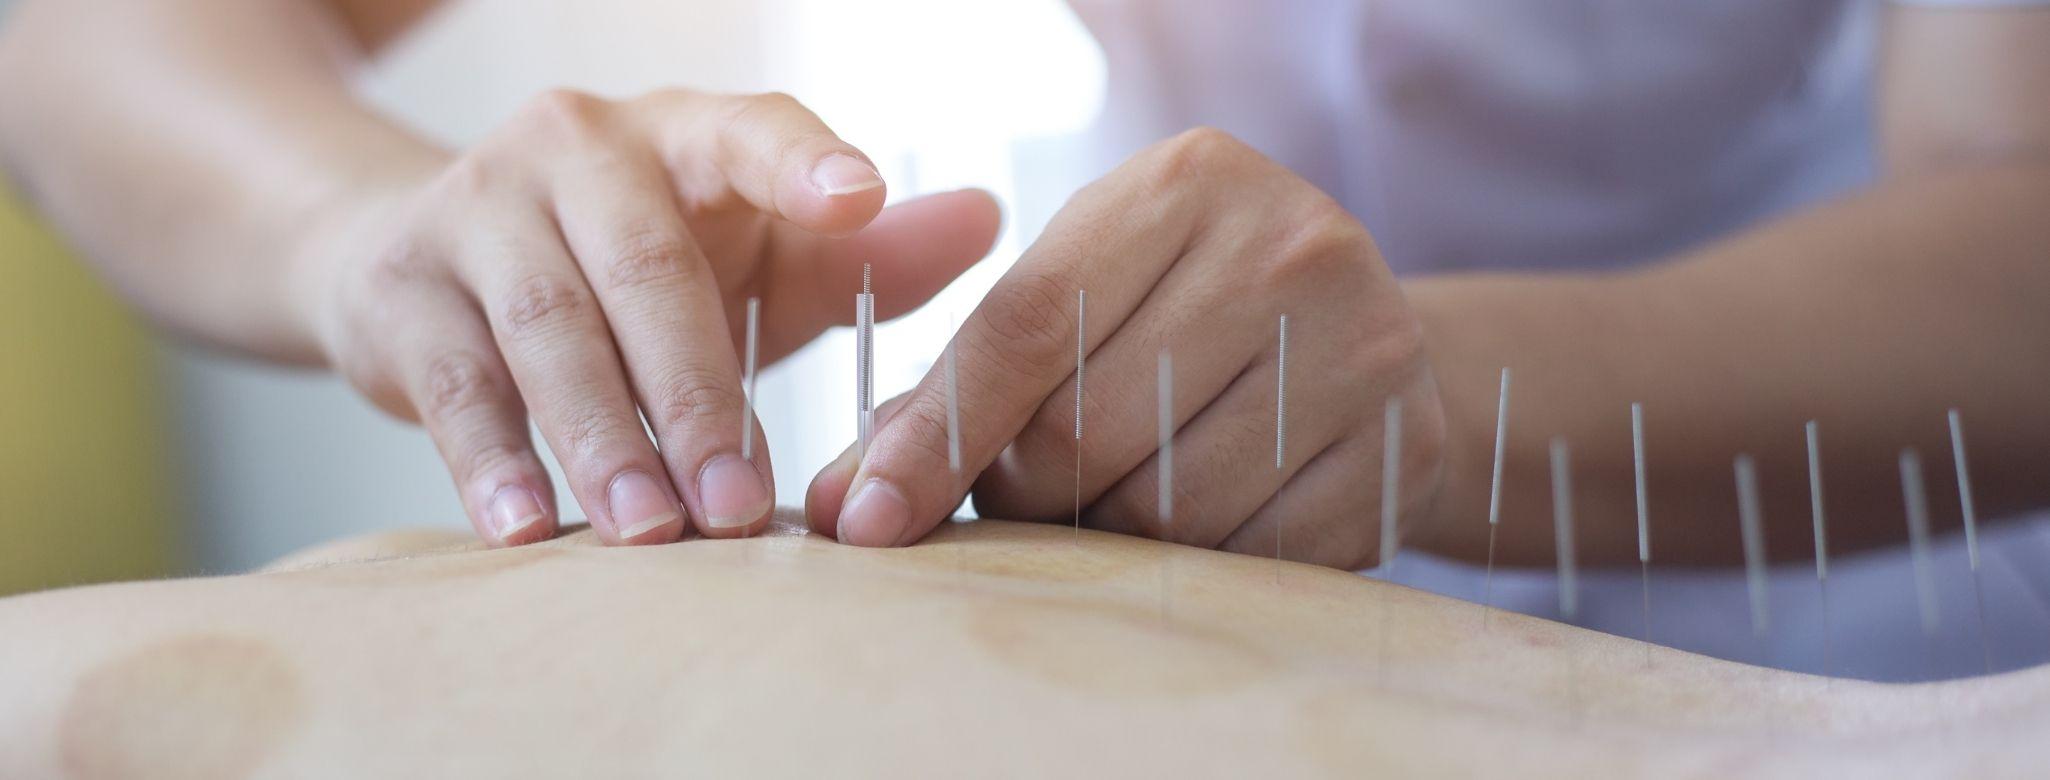 curso-de-acupuntura-espaco-ki